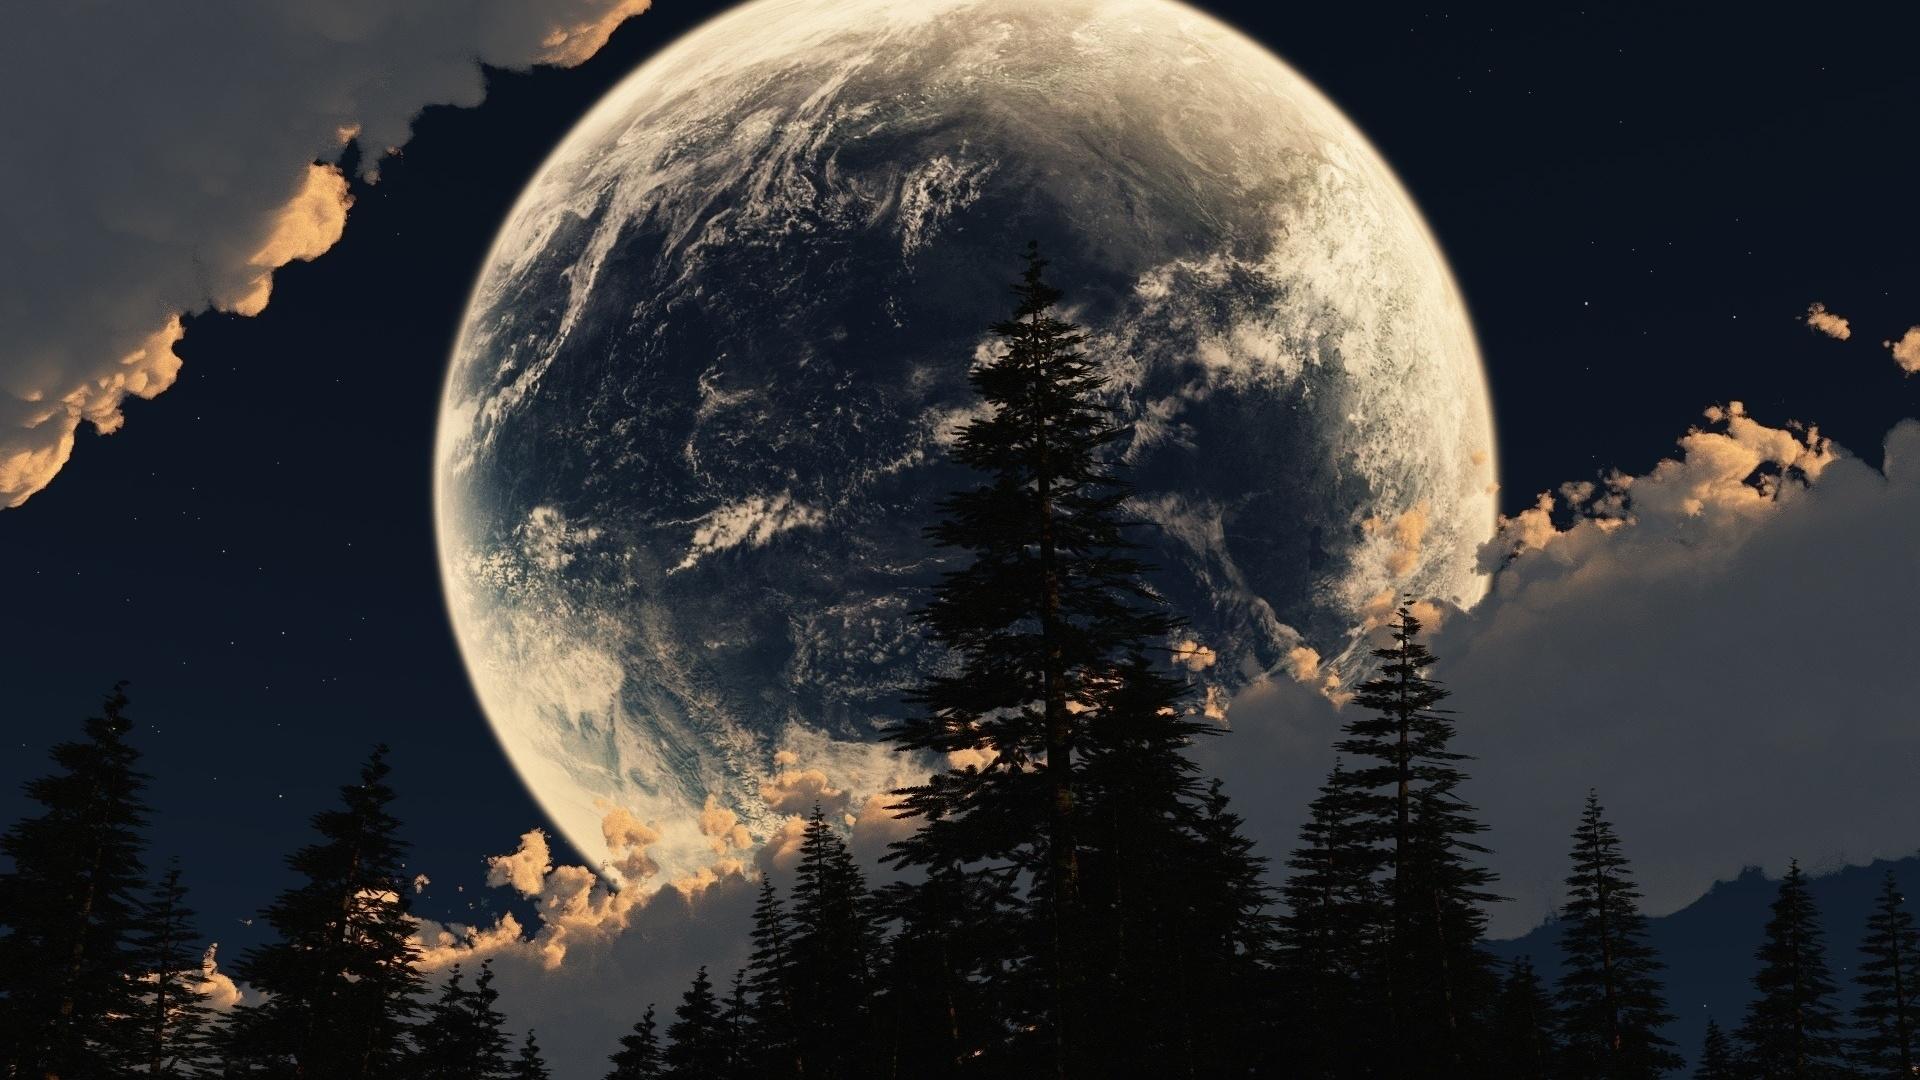 Классные картинки луны